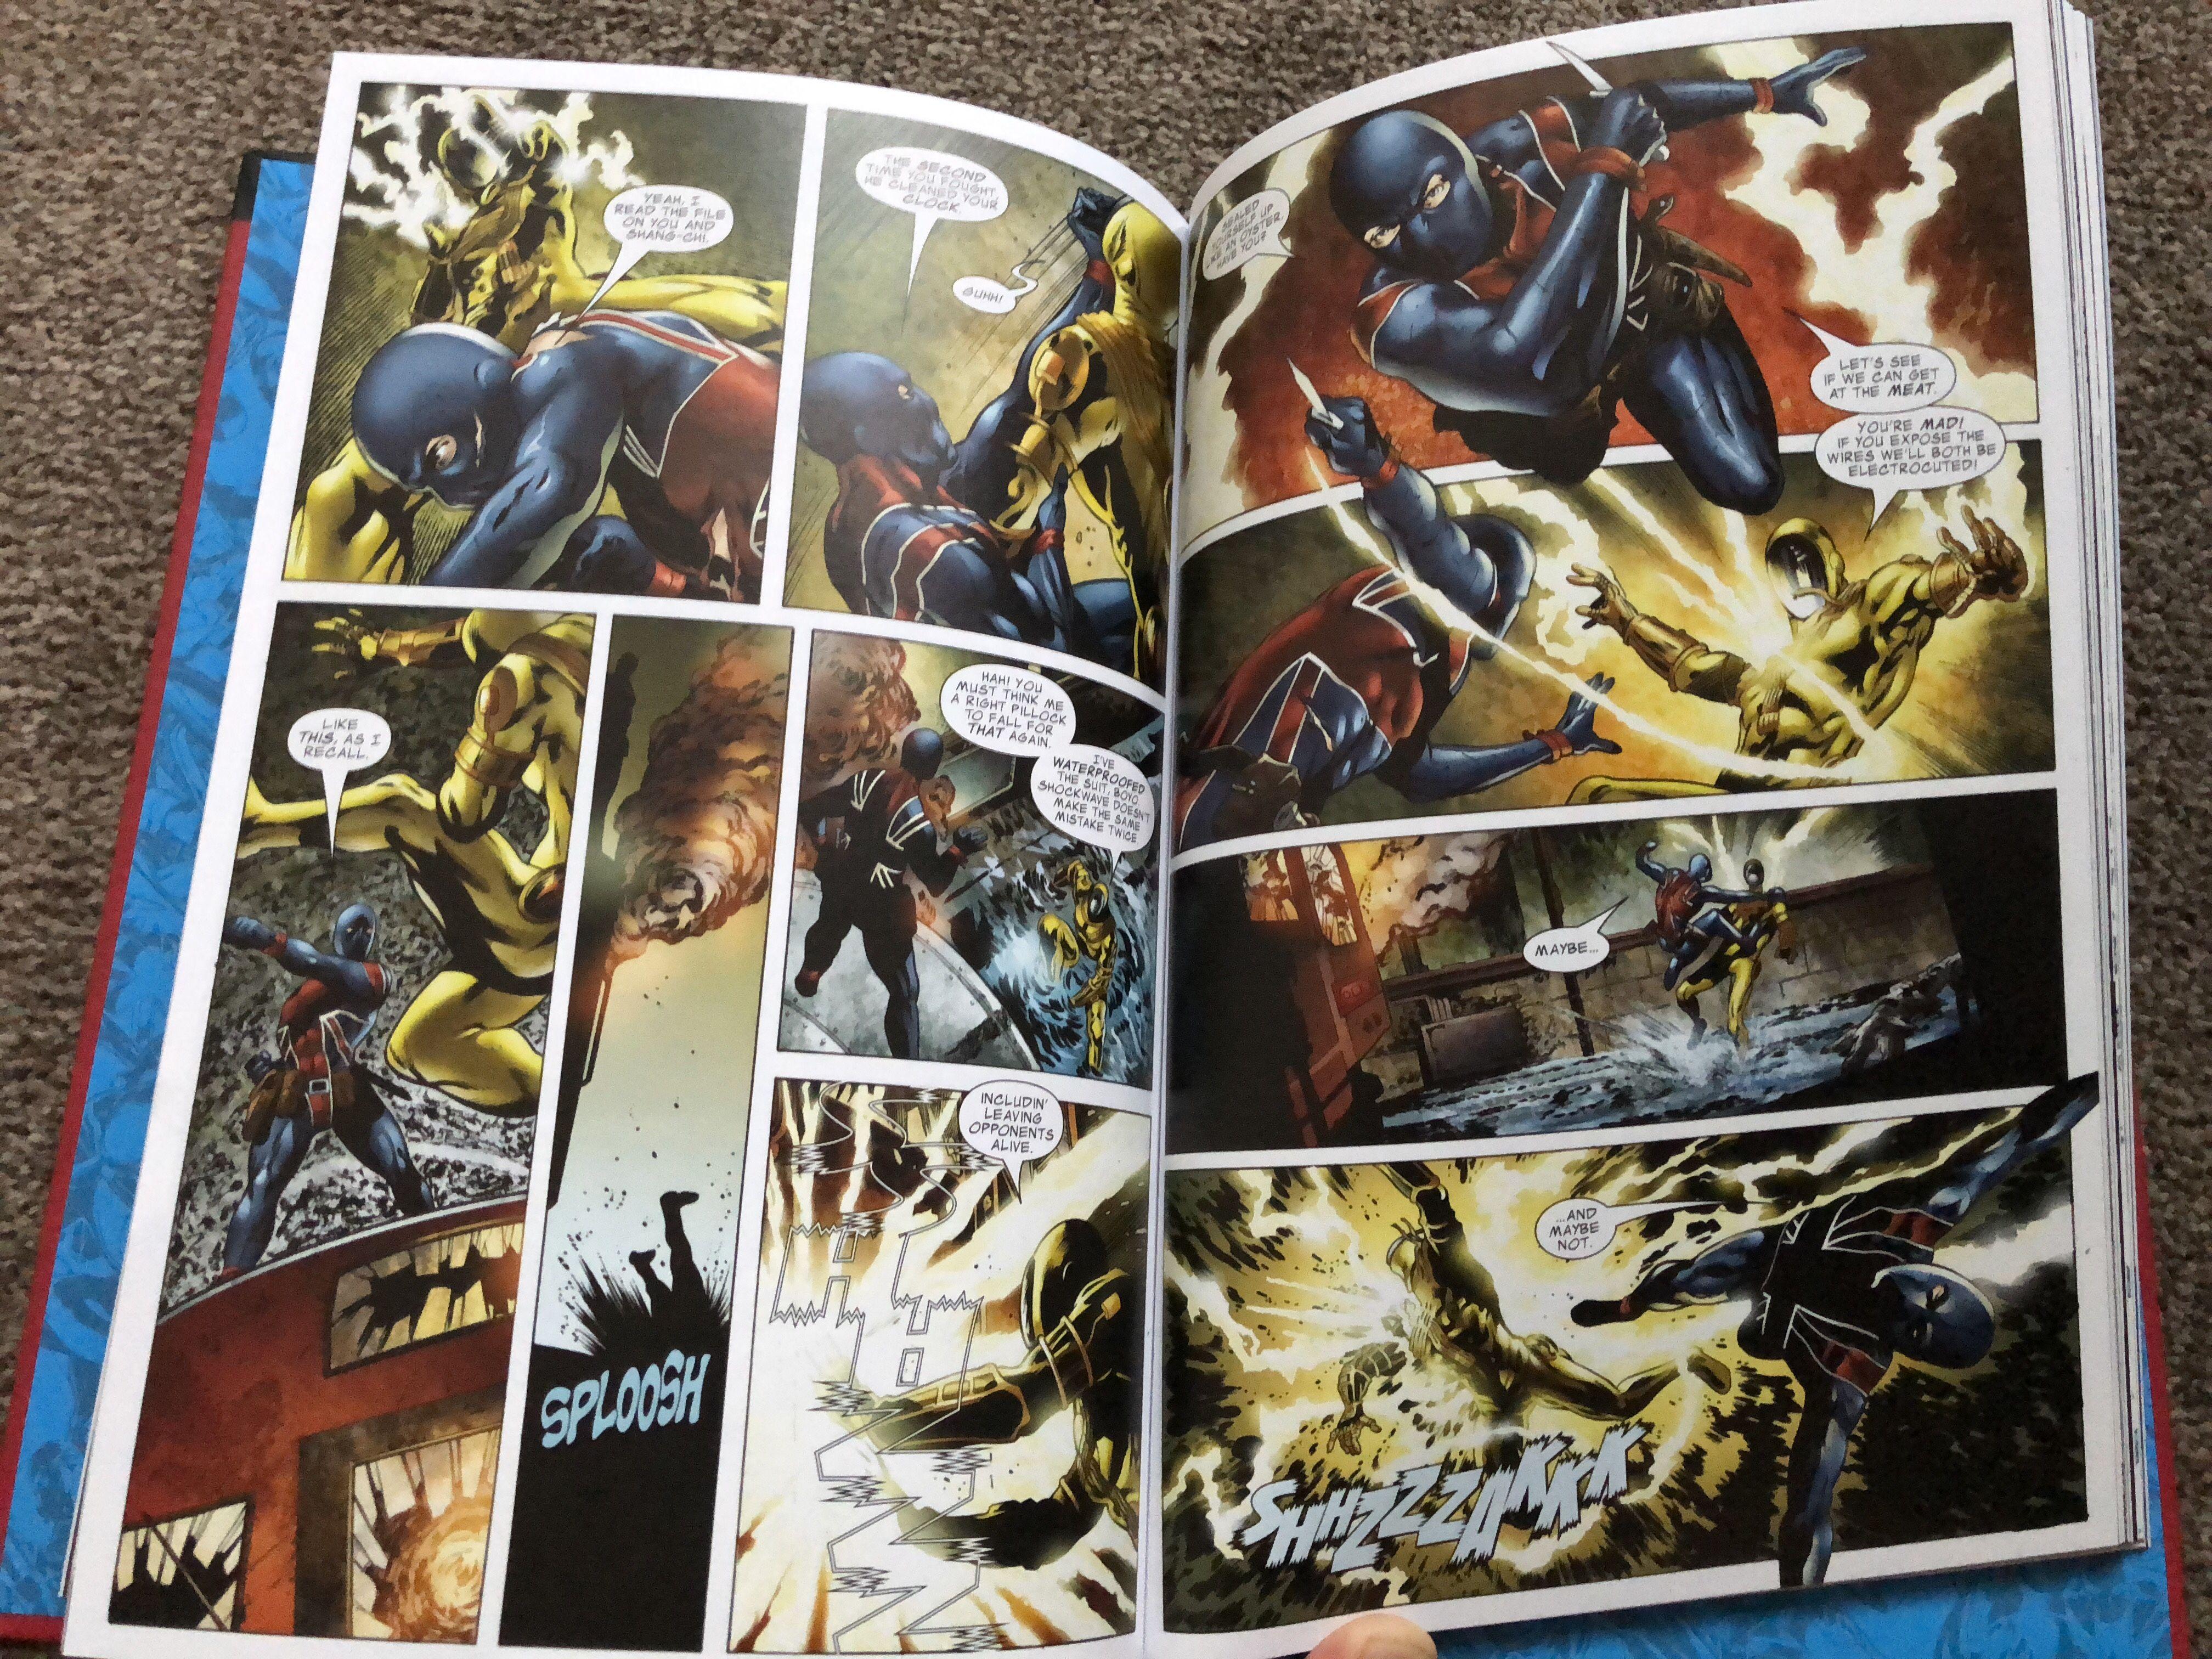 72 Union Jack Marvel S Mightiest Heroes Graphic Novel Hachette Partworks 2nd Series Graphic Novel Marvel Novels